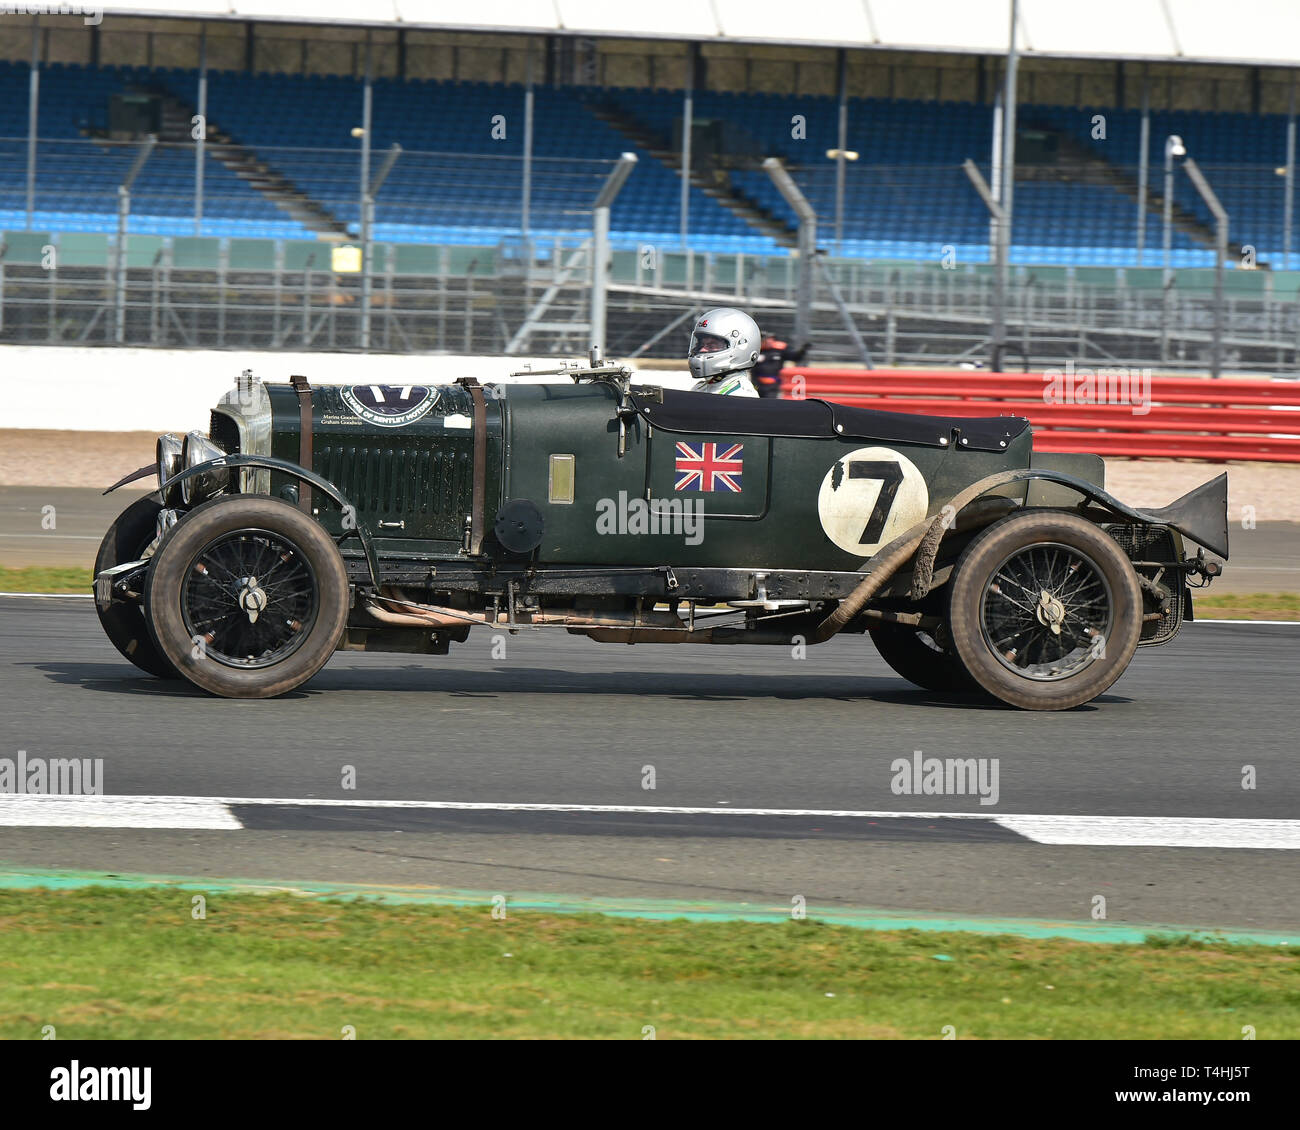 Graham Goodwin, Bentley 4½ Litre Le Mans replica, Benjafield 100, 100 Years of Bentley, April 2019,  Silverstone, Northamptonshire, England, circuit r - Stock Image